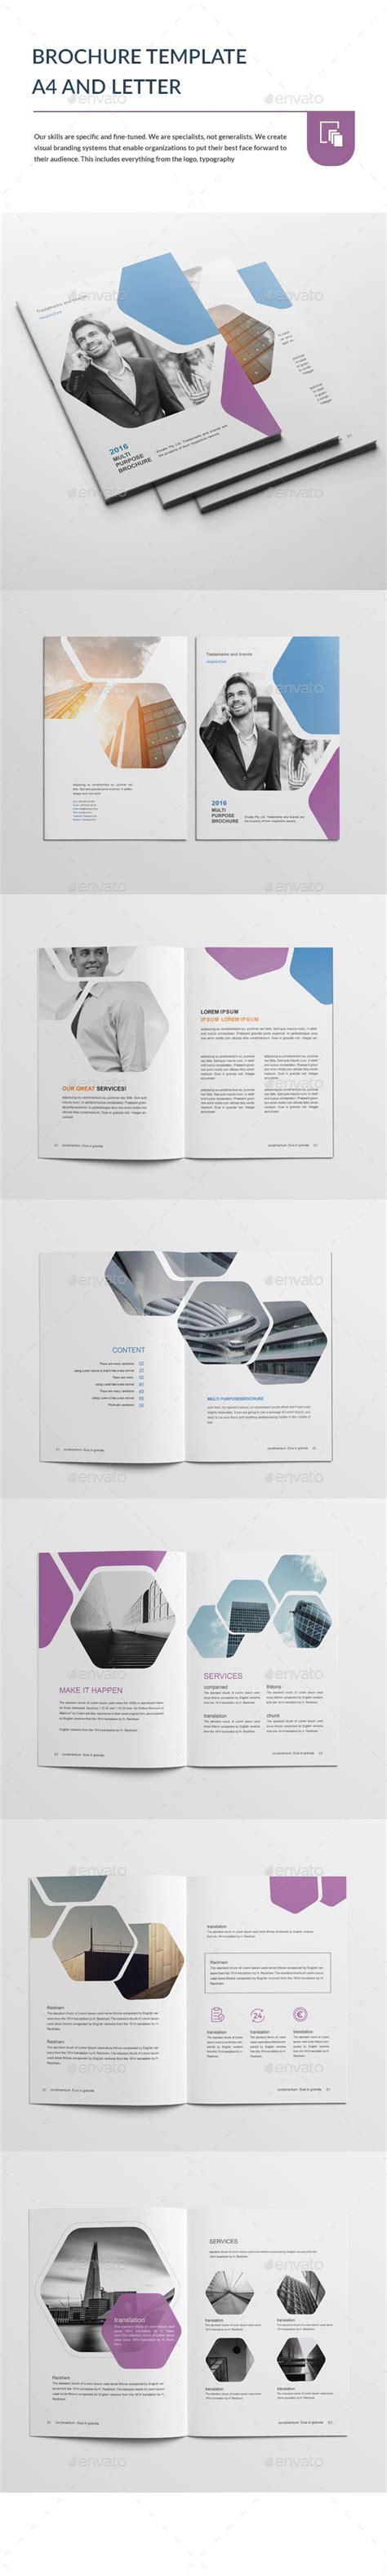 brochure template   letter psd template format